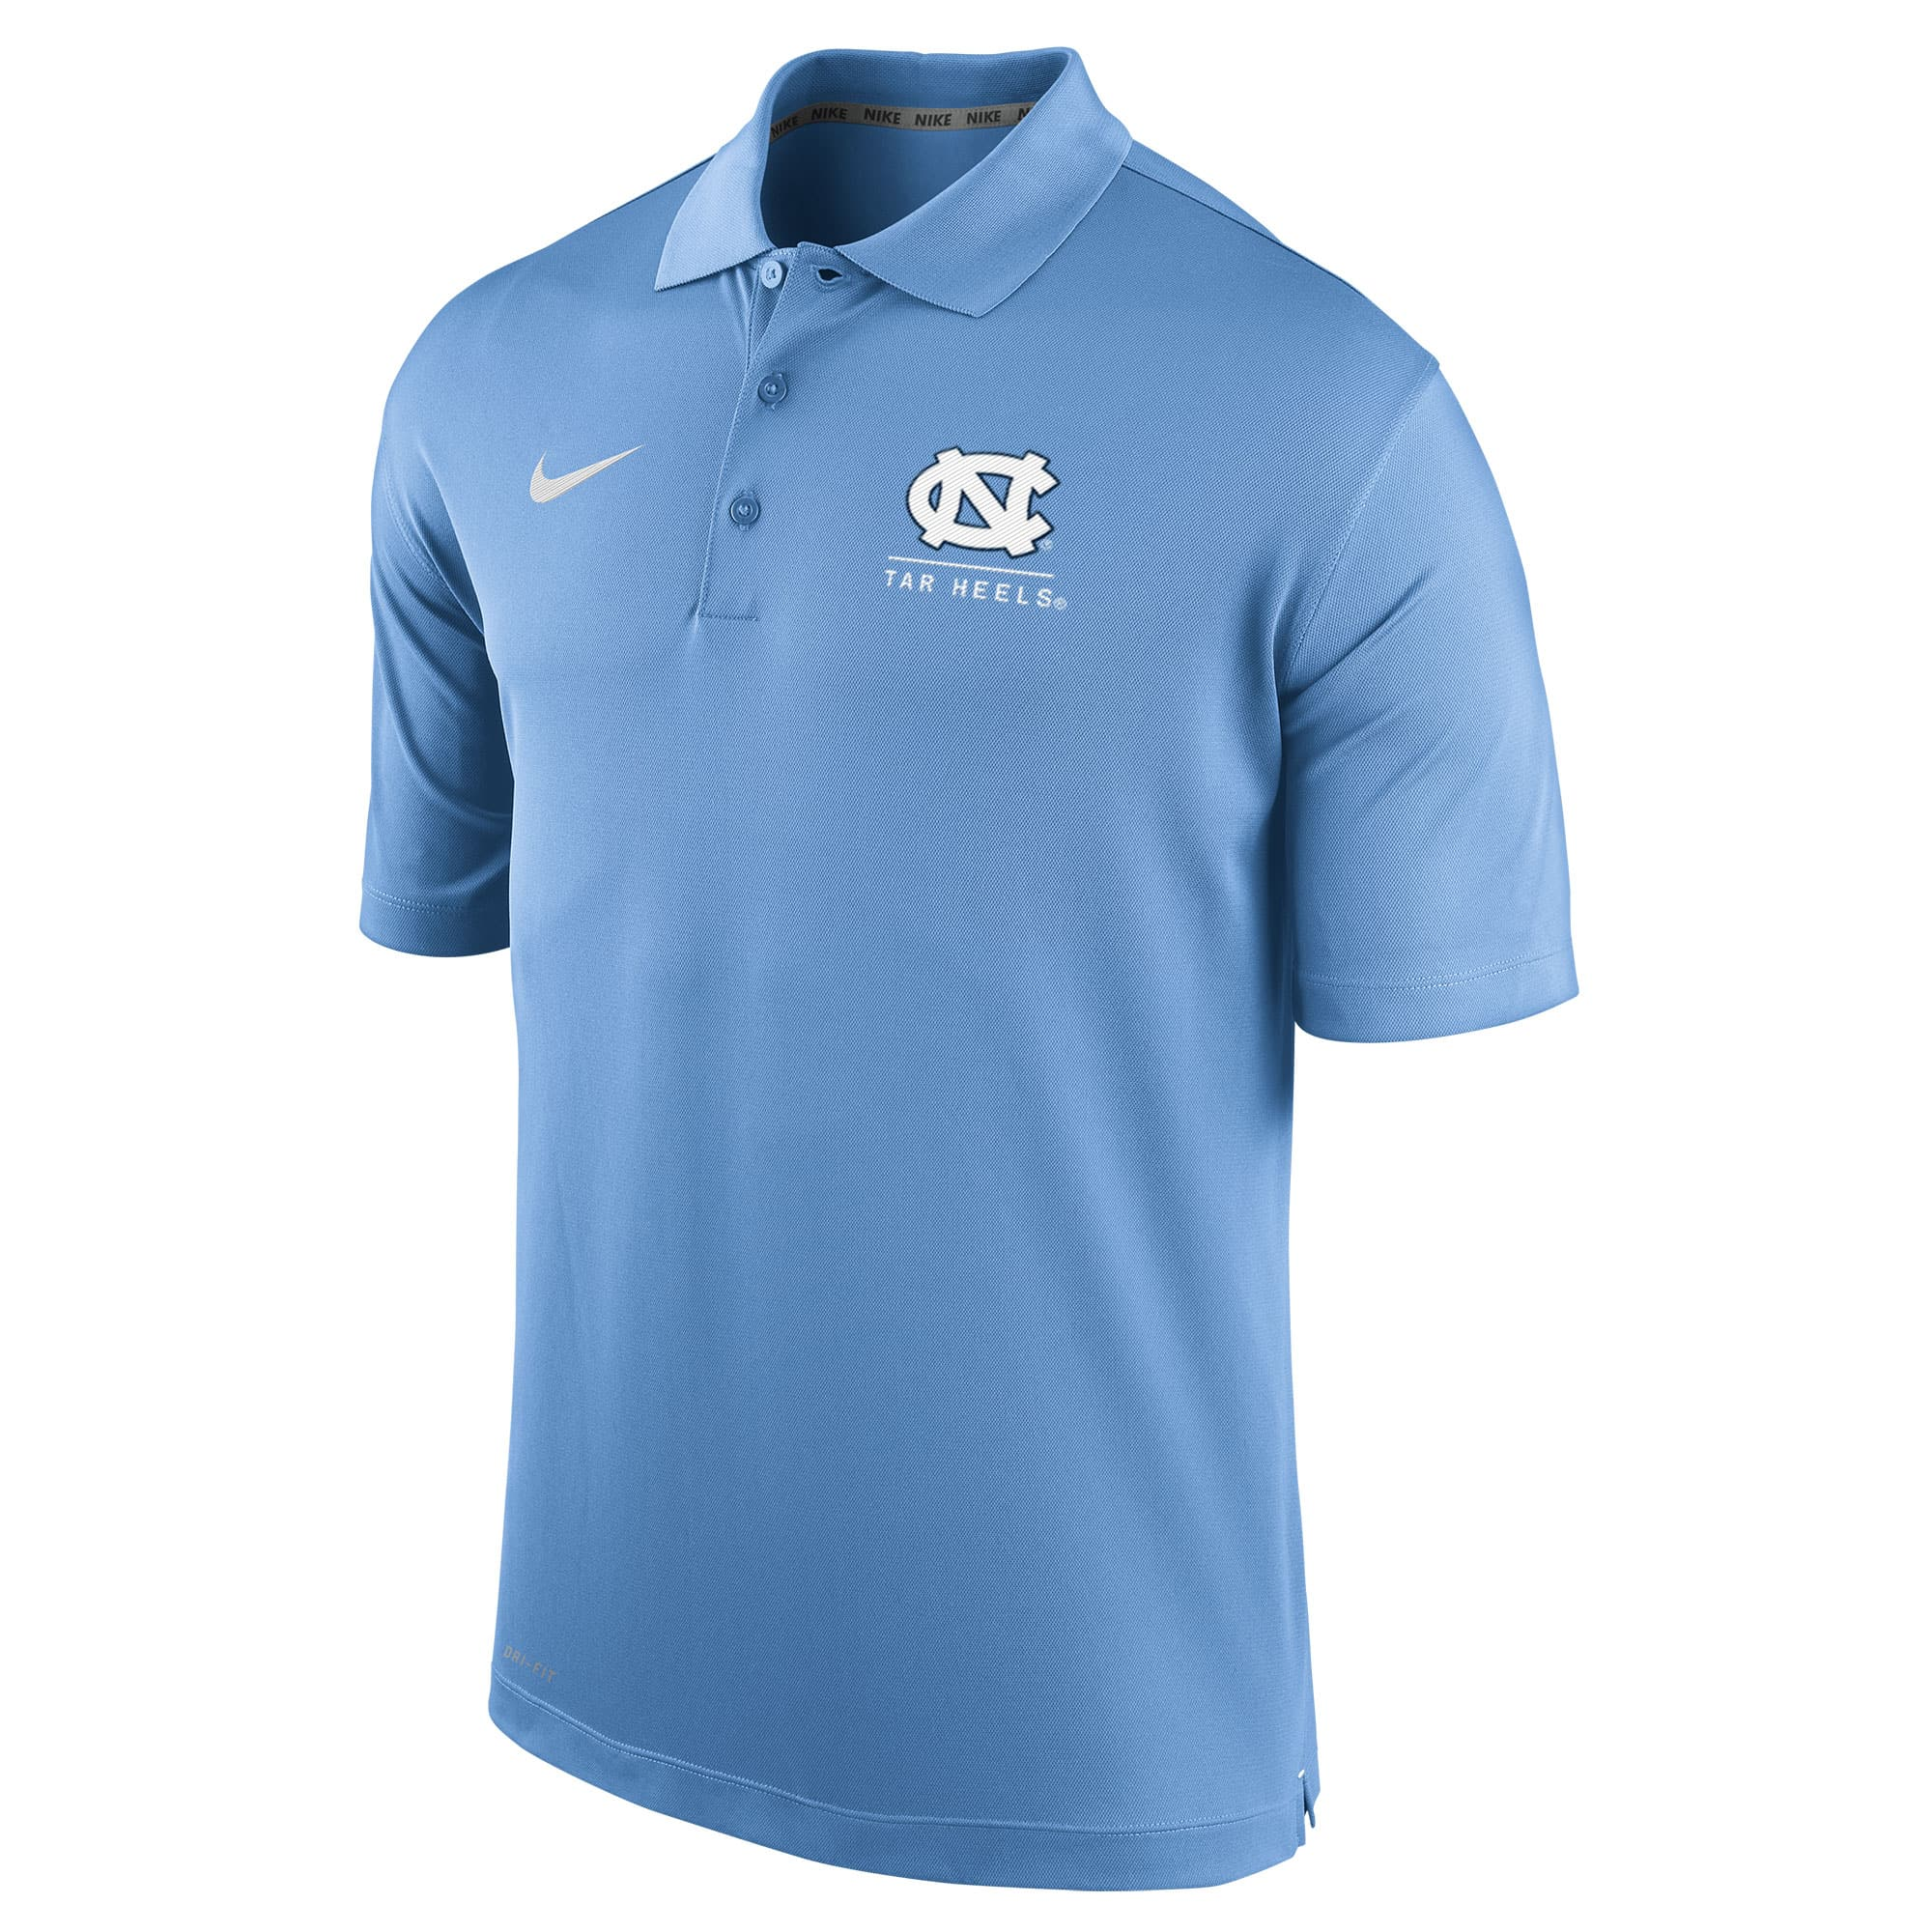 ae22cd70 NCAA Fan Shop - Walmart.com